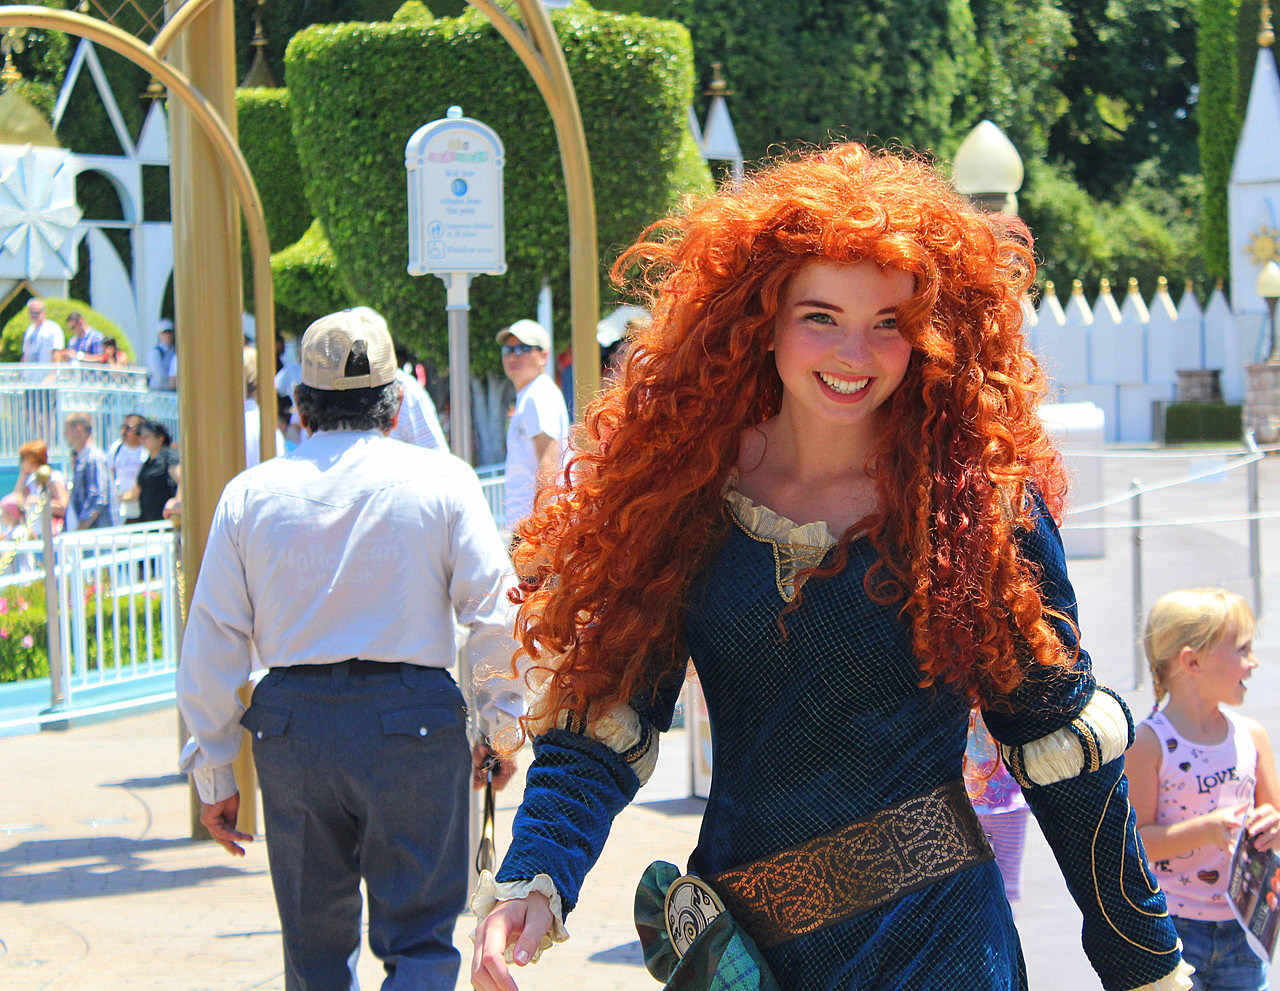 Disneyland's princess merida looks just like the real thing